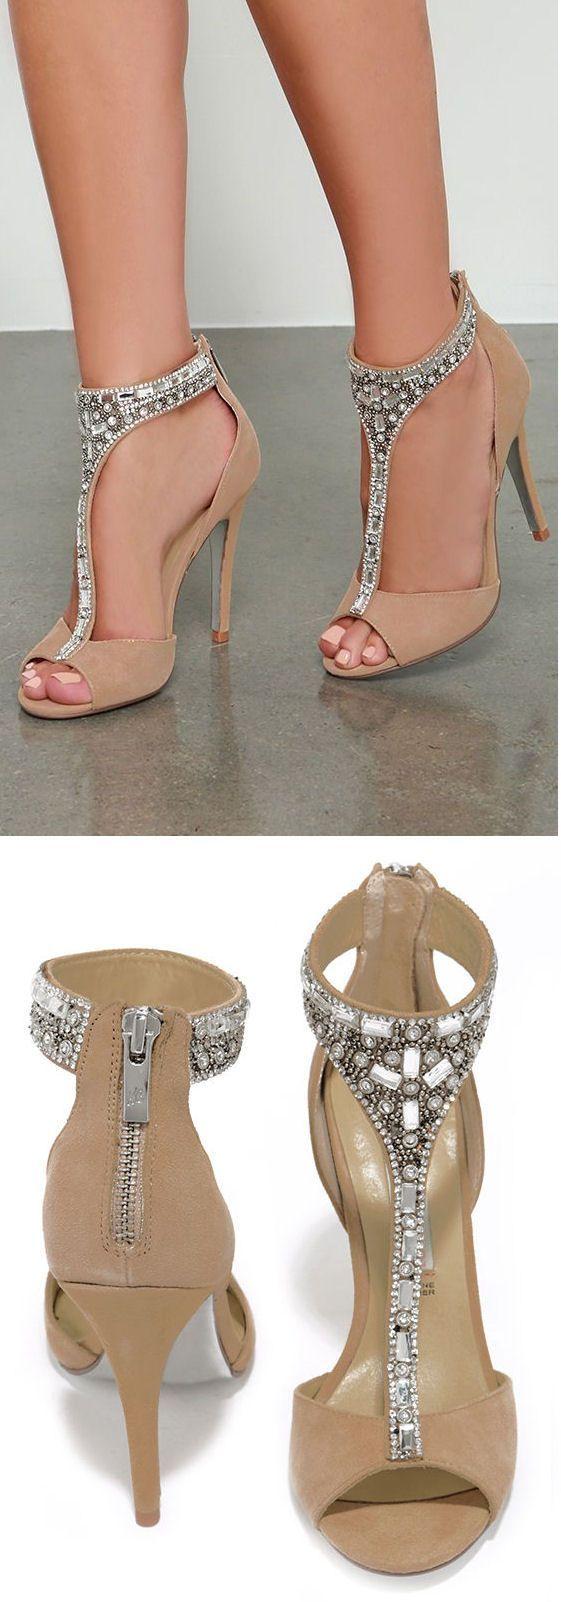 Nude Suede Bejeweled Heels